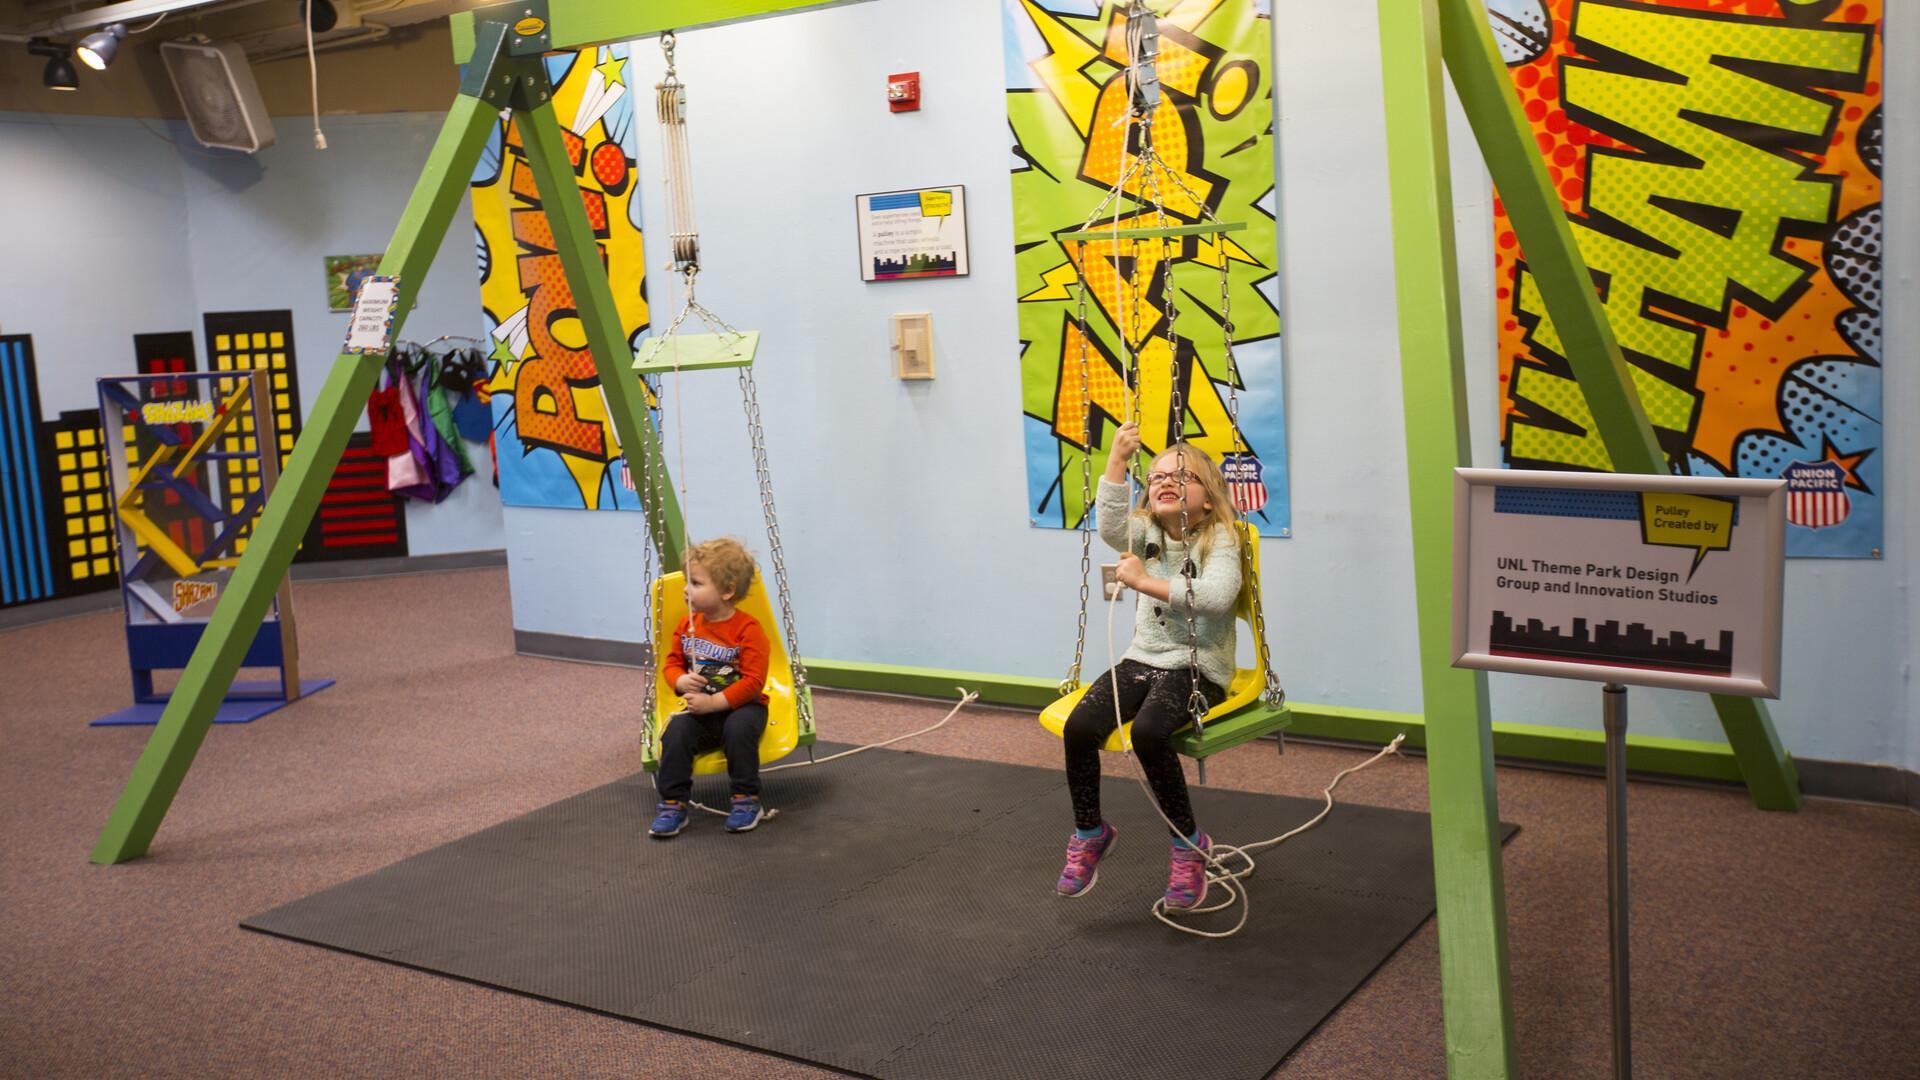 Students design, build kids' superhero exhibit